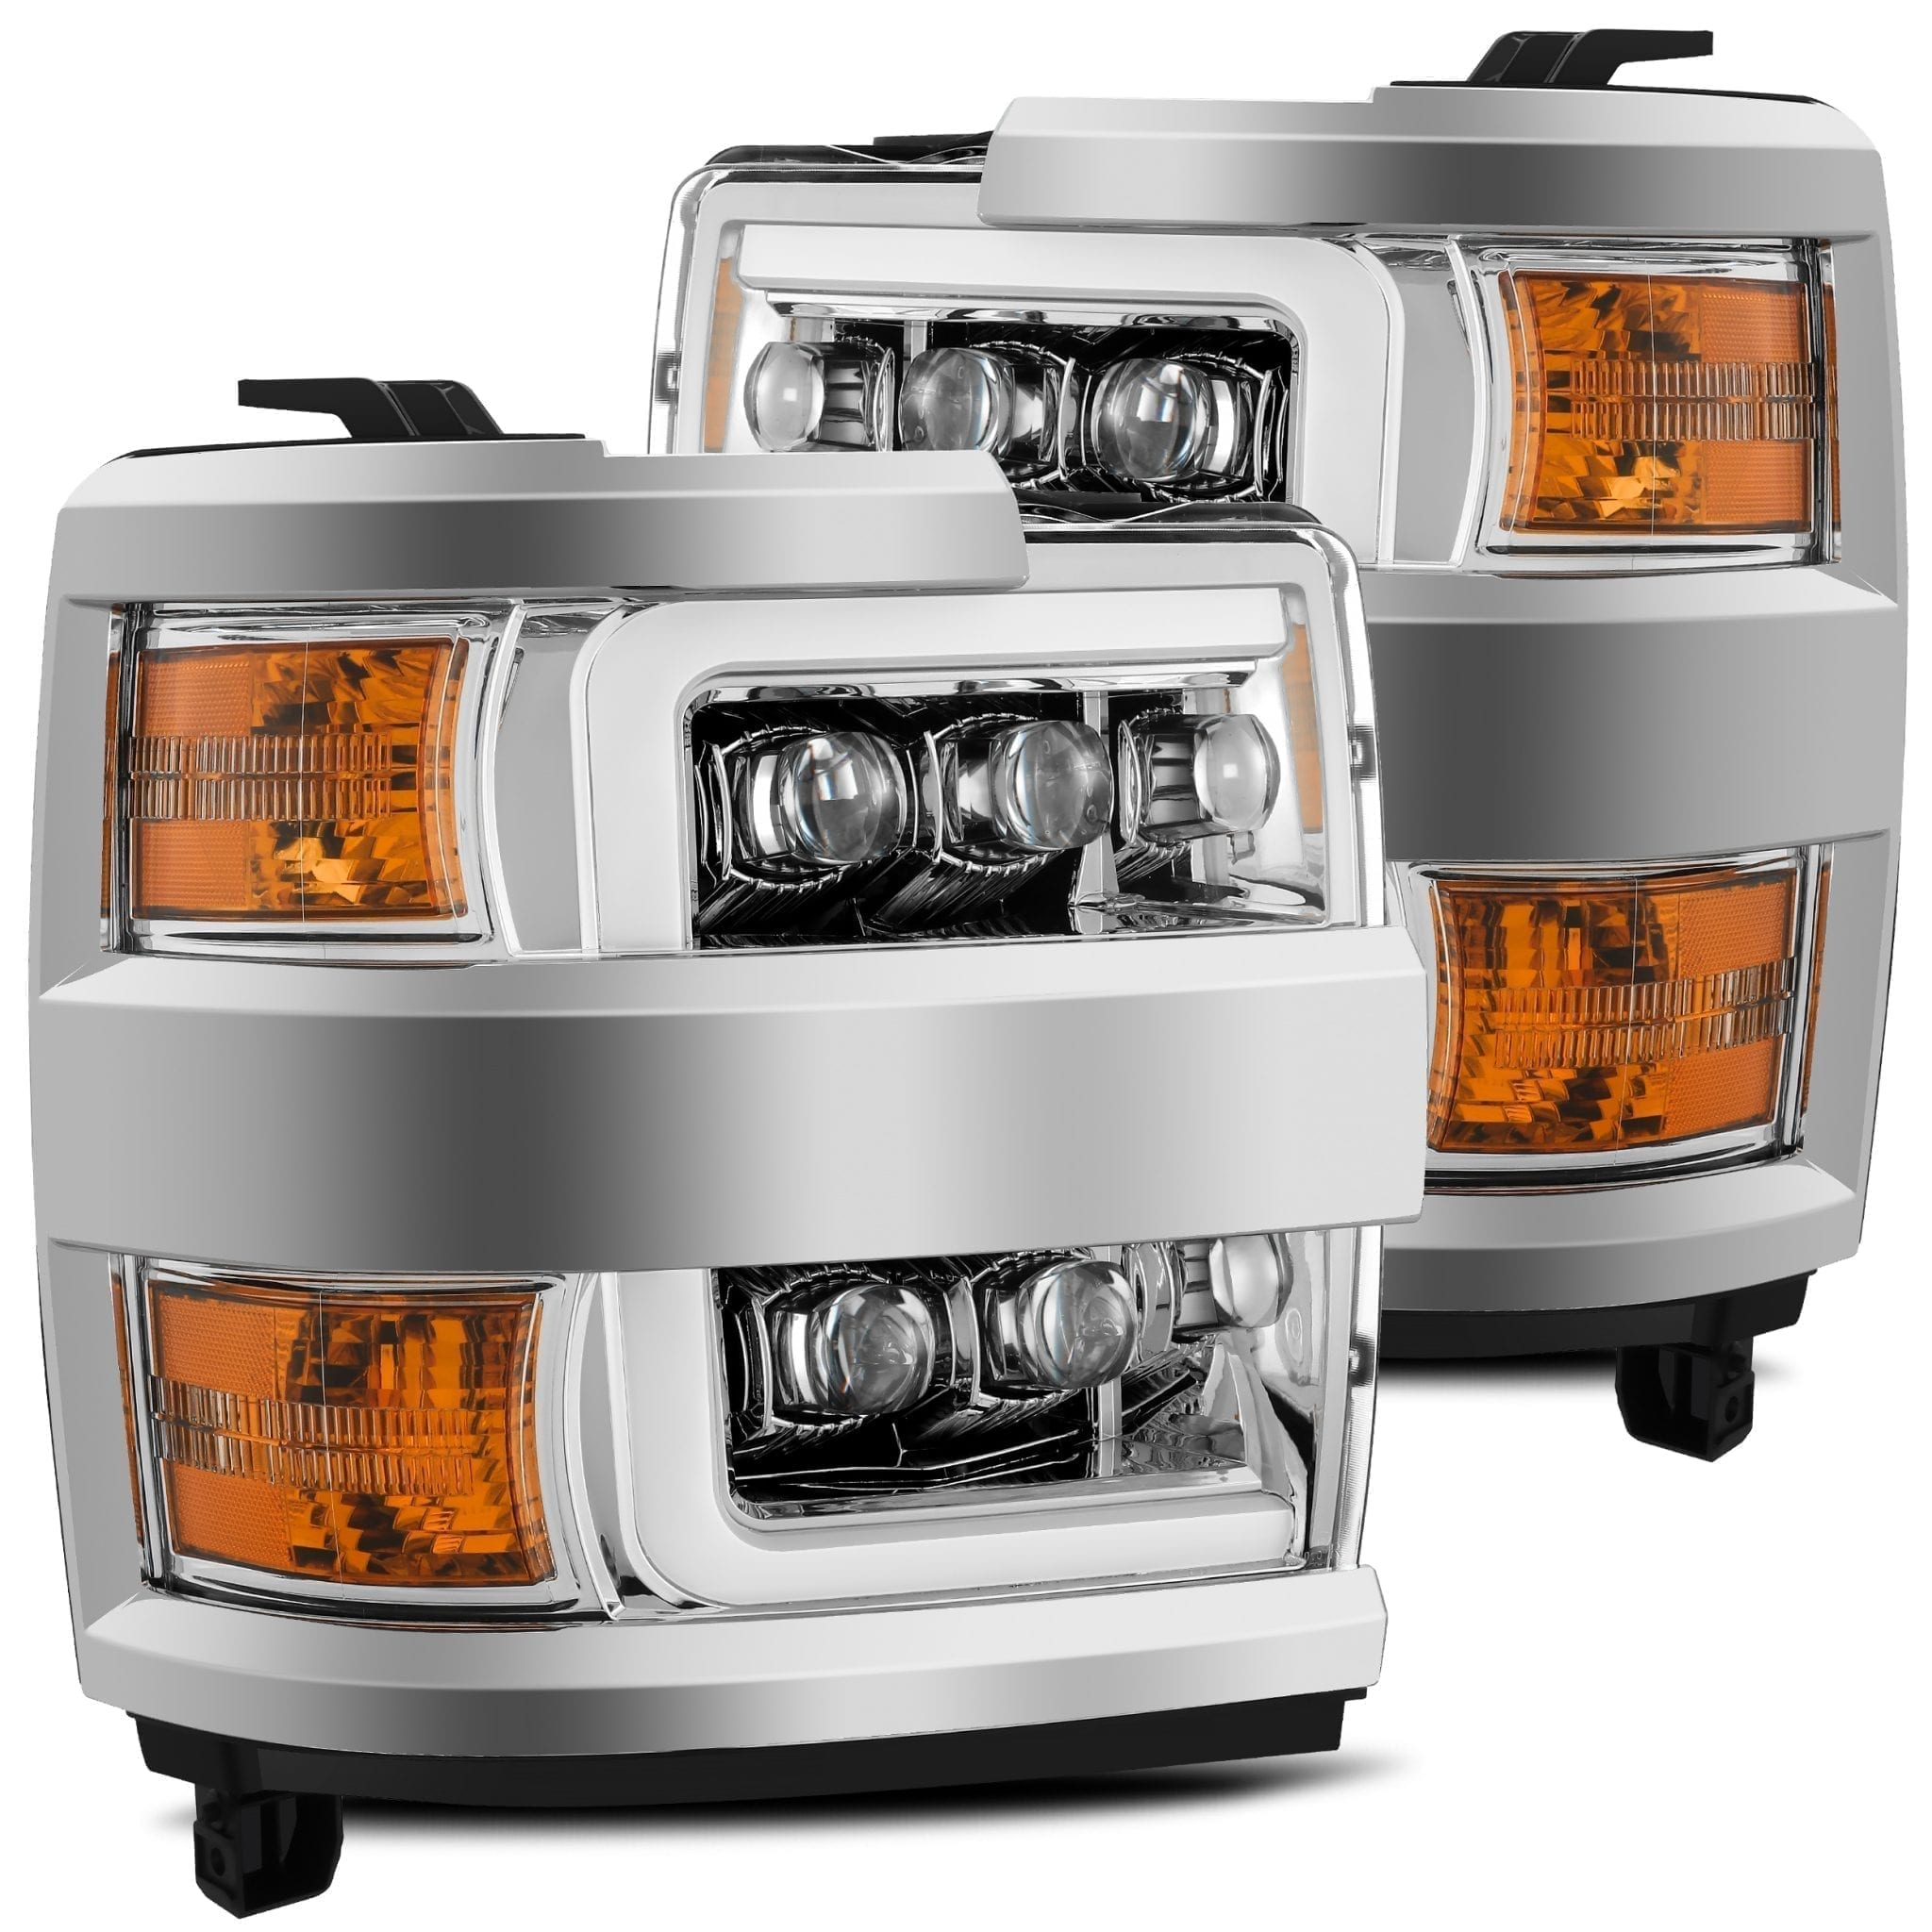 2015 2016 2017 2018 2019 Chevrolet Silverado 2500HD 3500HD NOVA-Series Full LED Projector Headlights Chrome